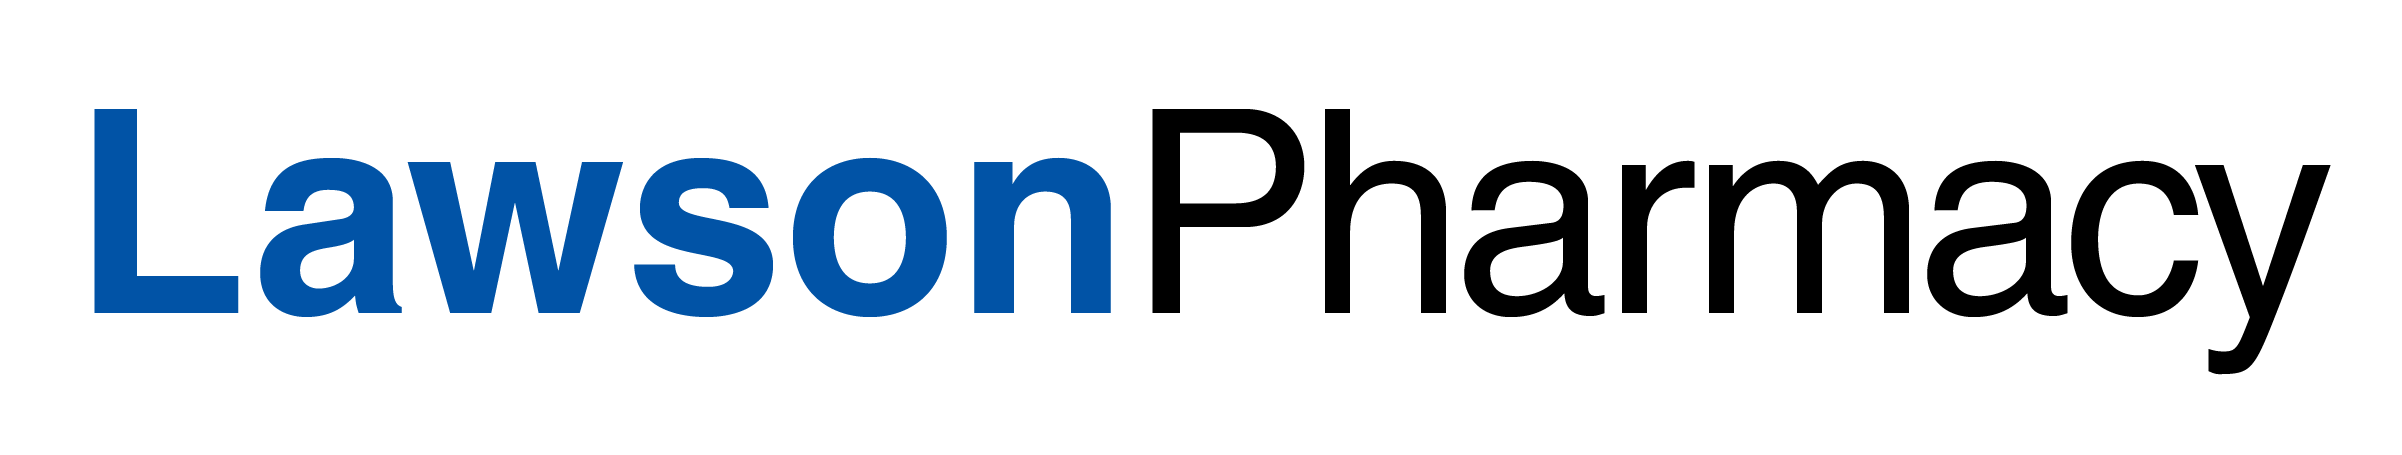 RI - Lawson Pharmacy